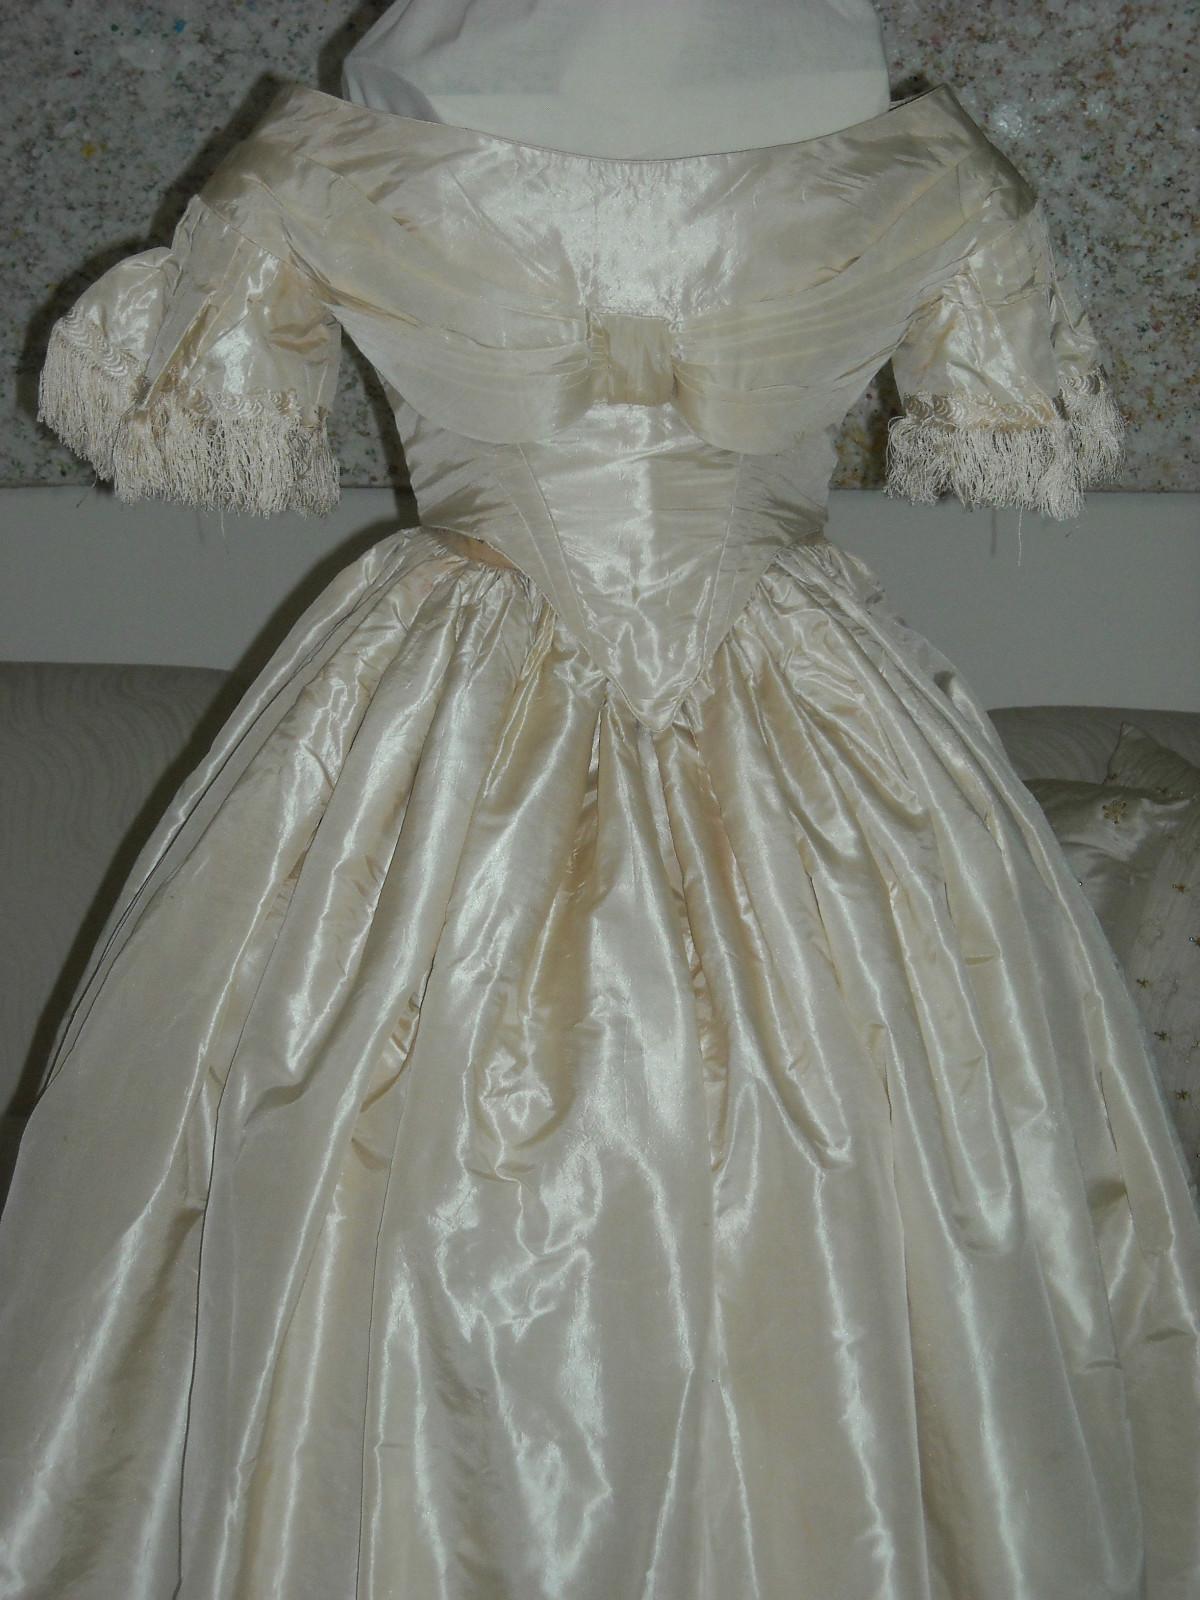 wedding dresses before 1840 photo - 1